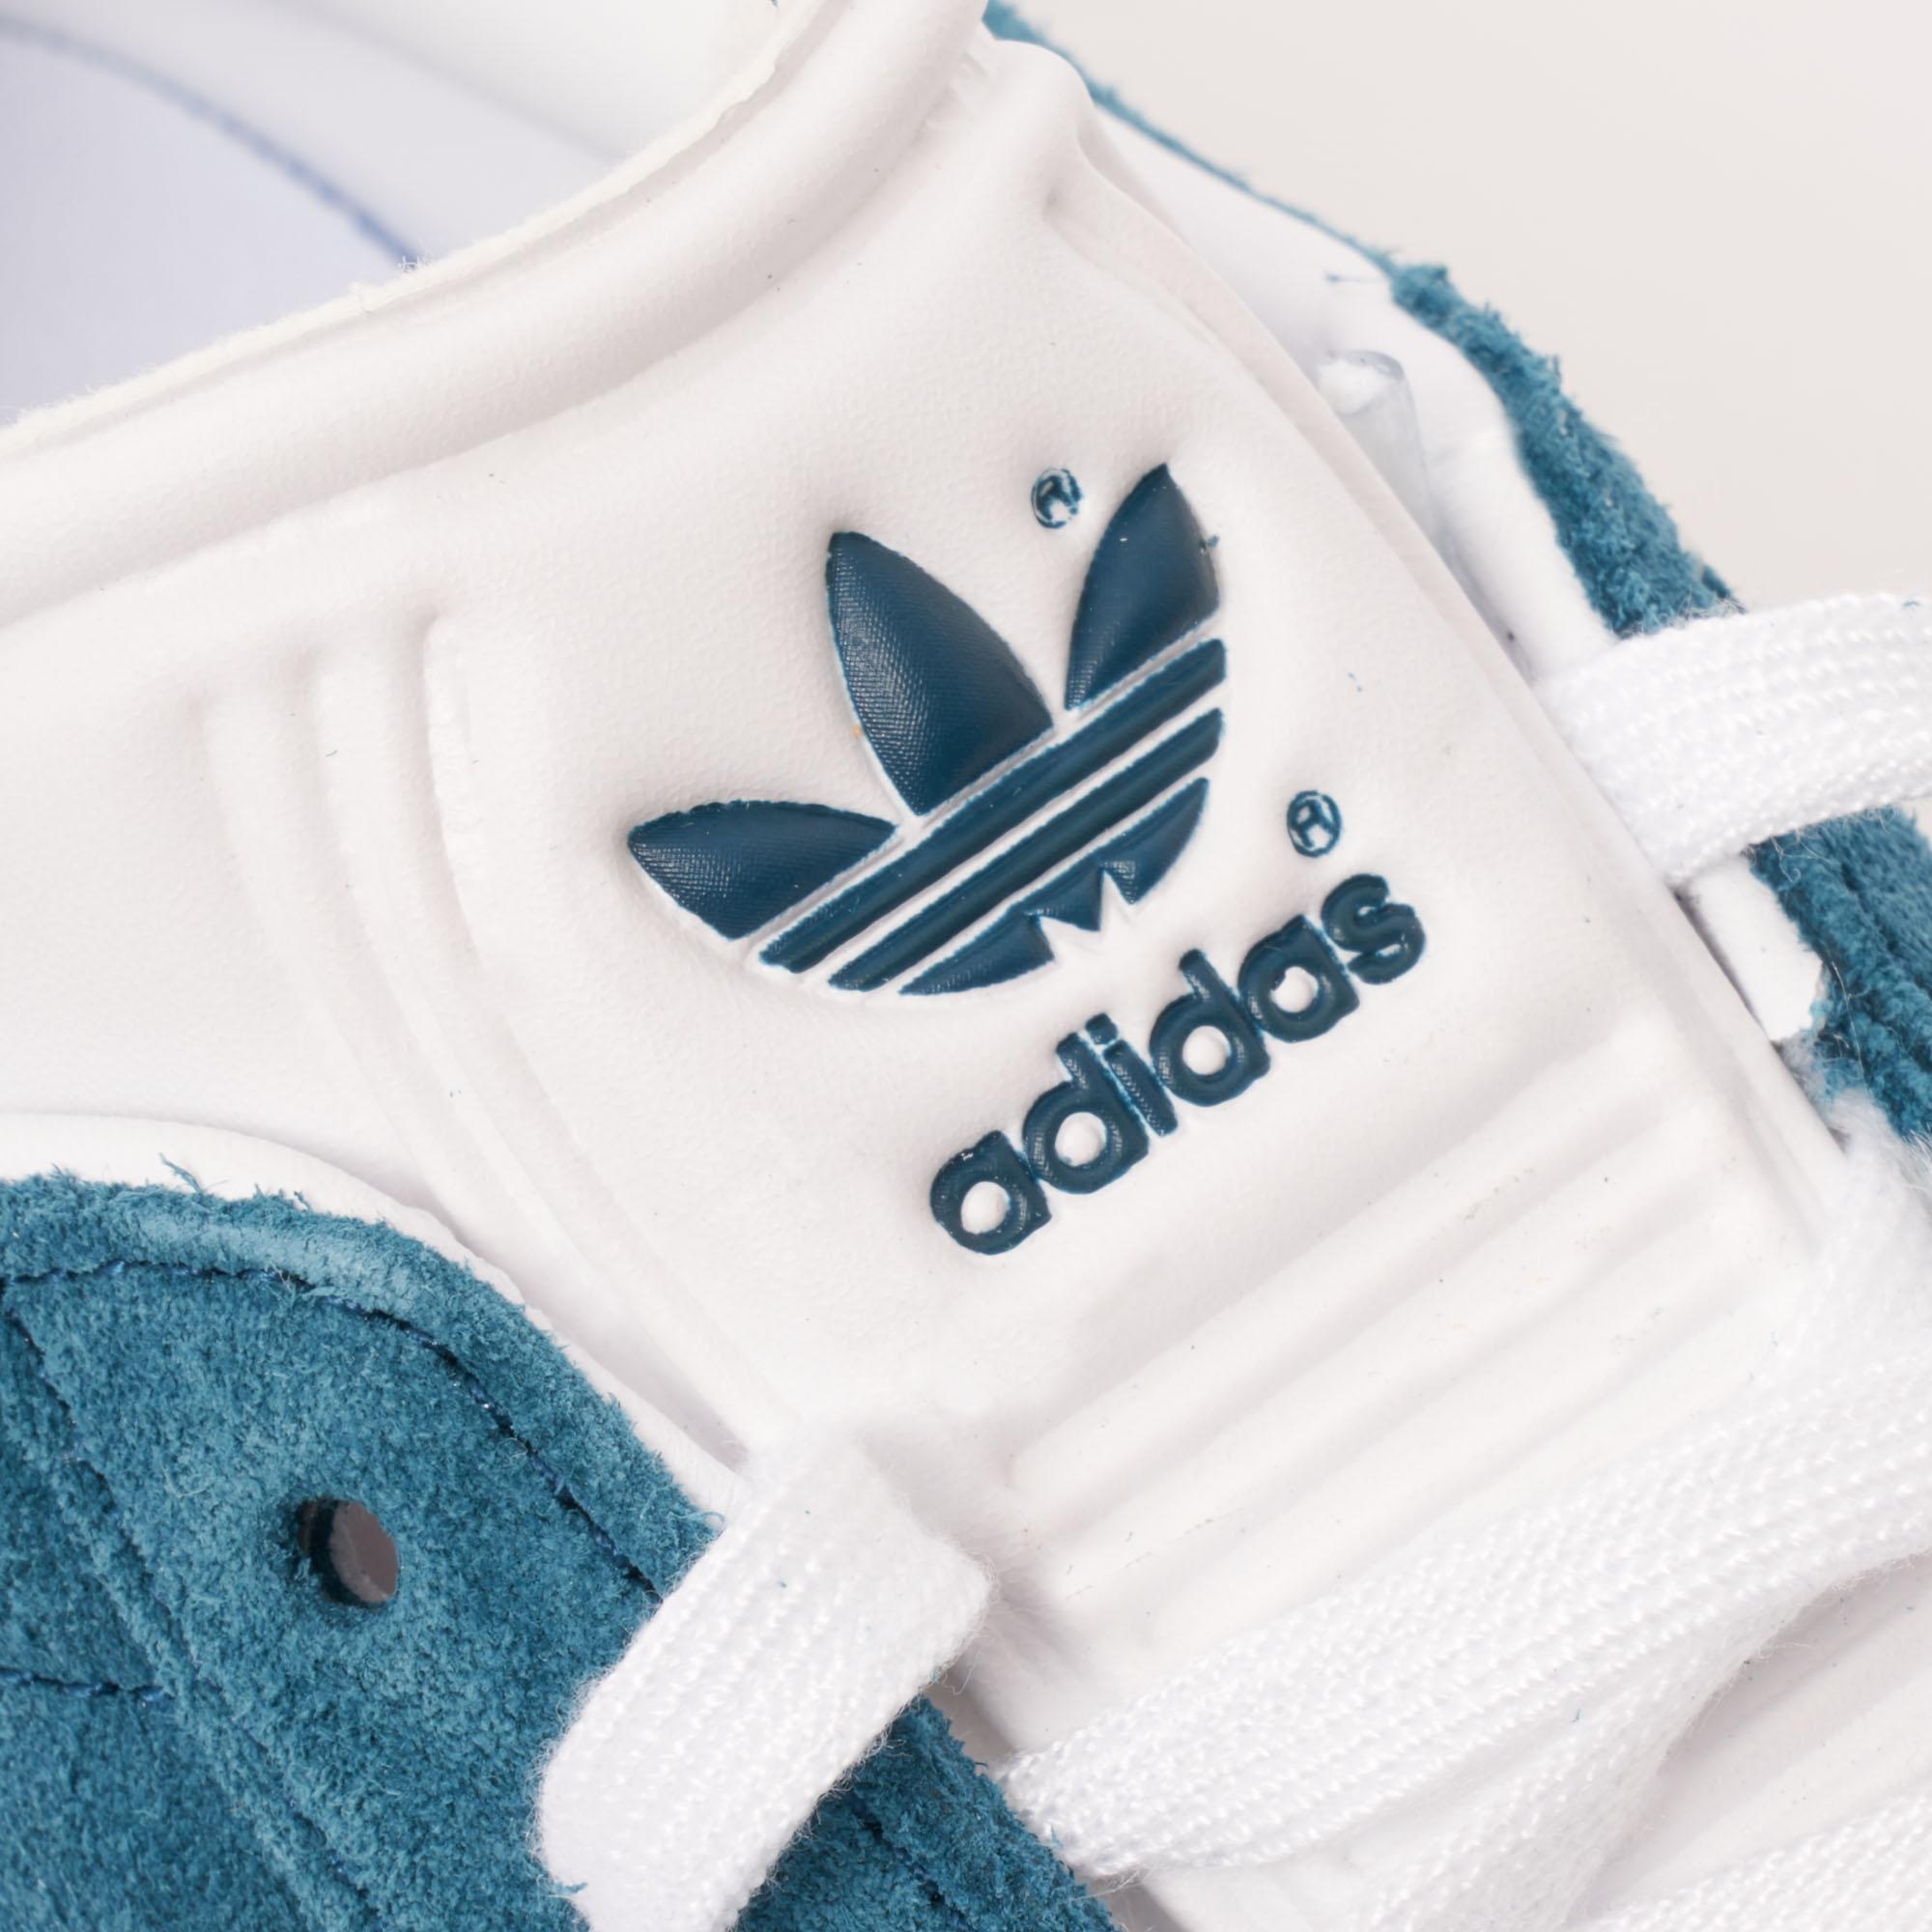 hélice Modernización Negociar  adidas Originals Suede Gazelle - Petrol Night & Ftw White in Blue for Men -  Lyst